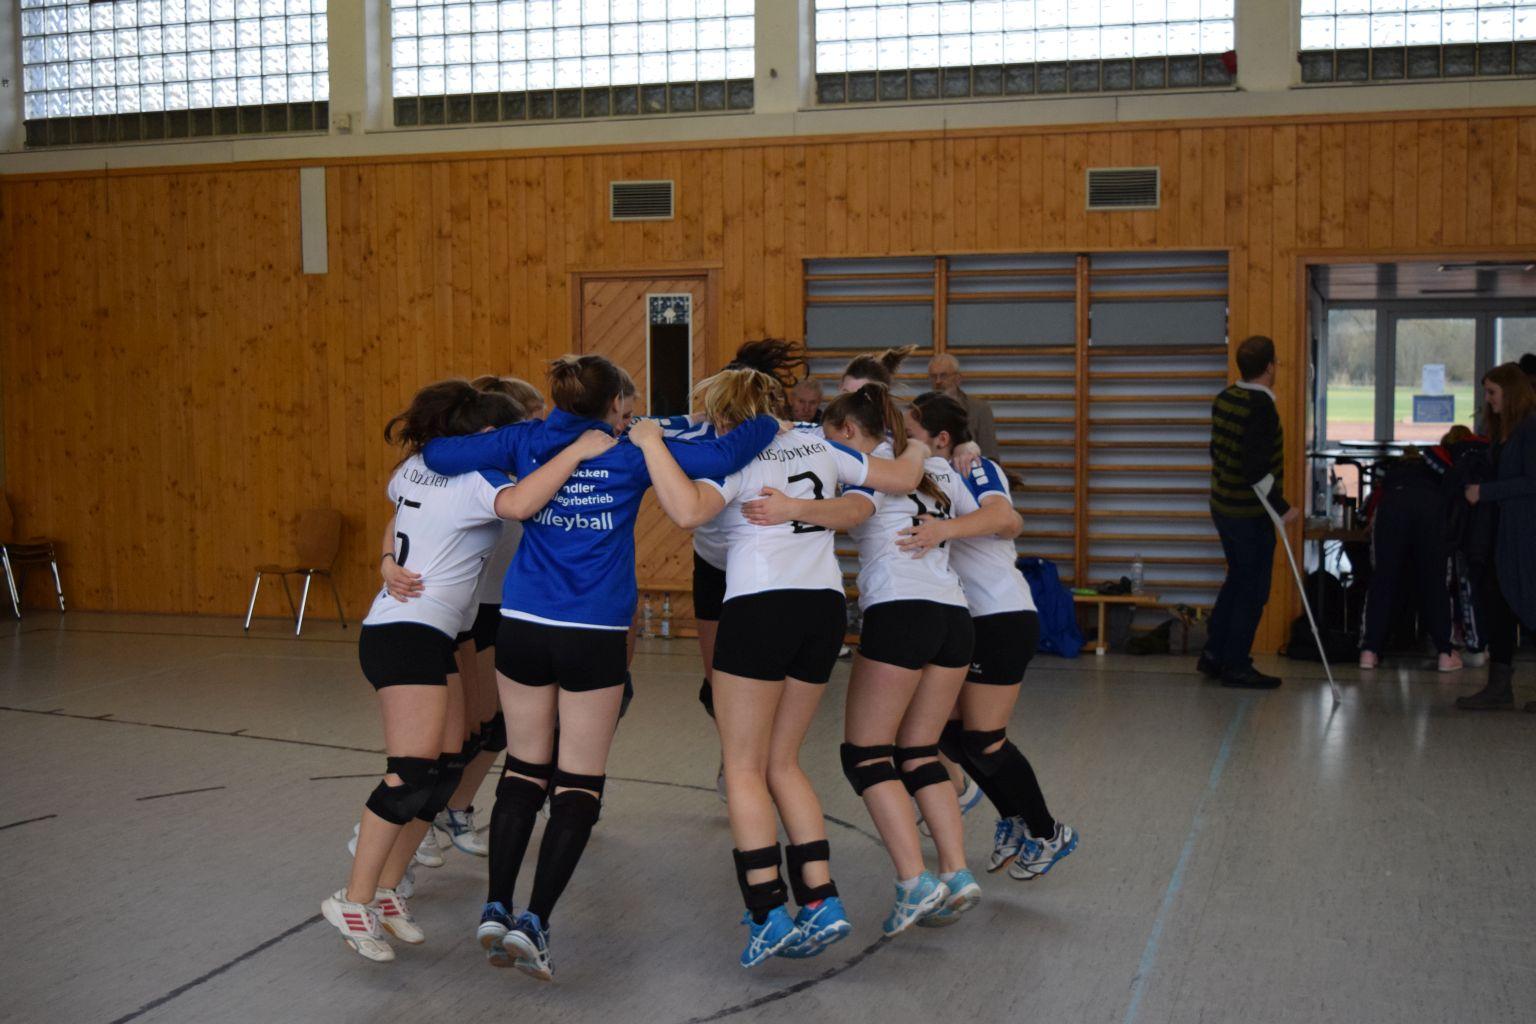 170311_Volleyball_DSC_0364